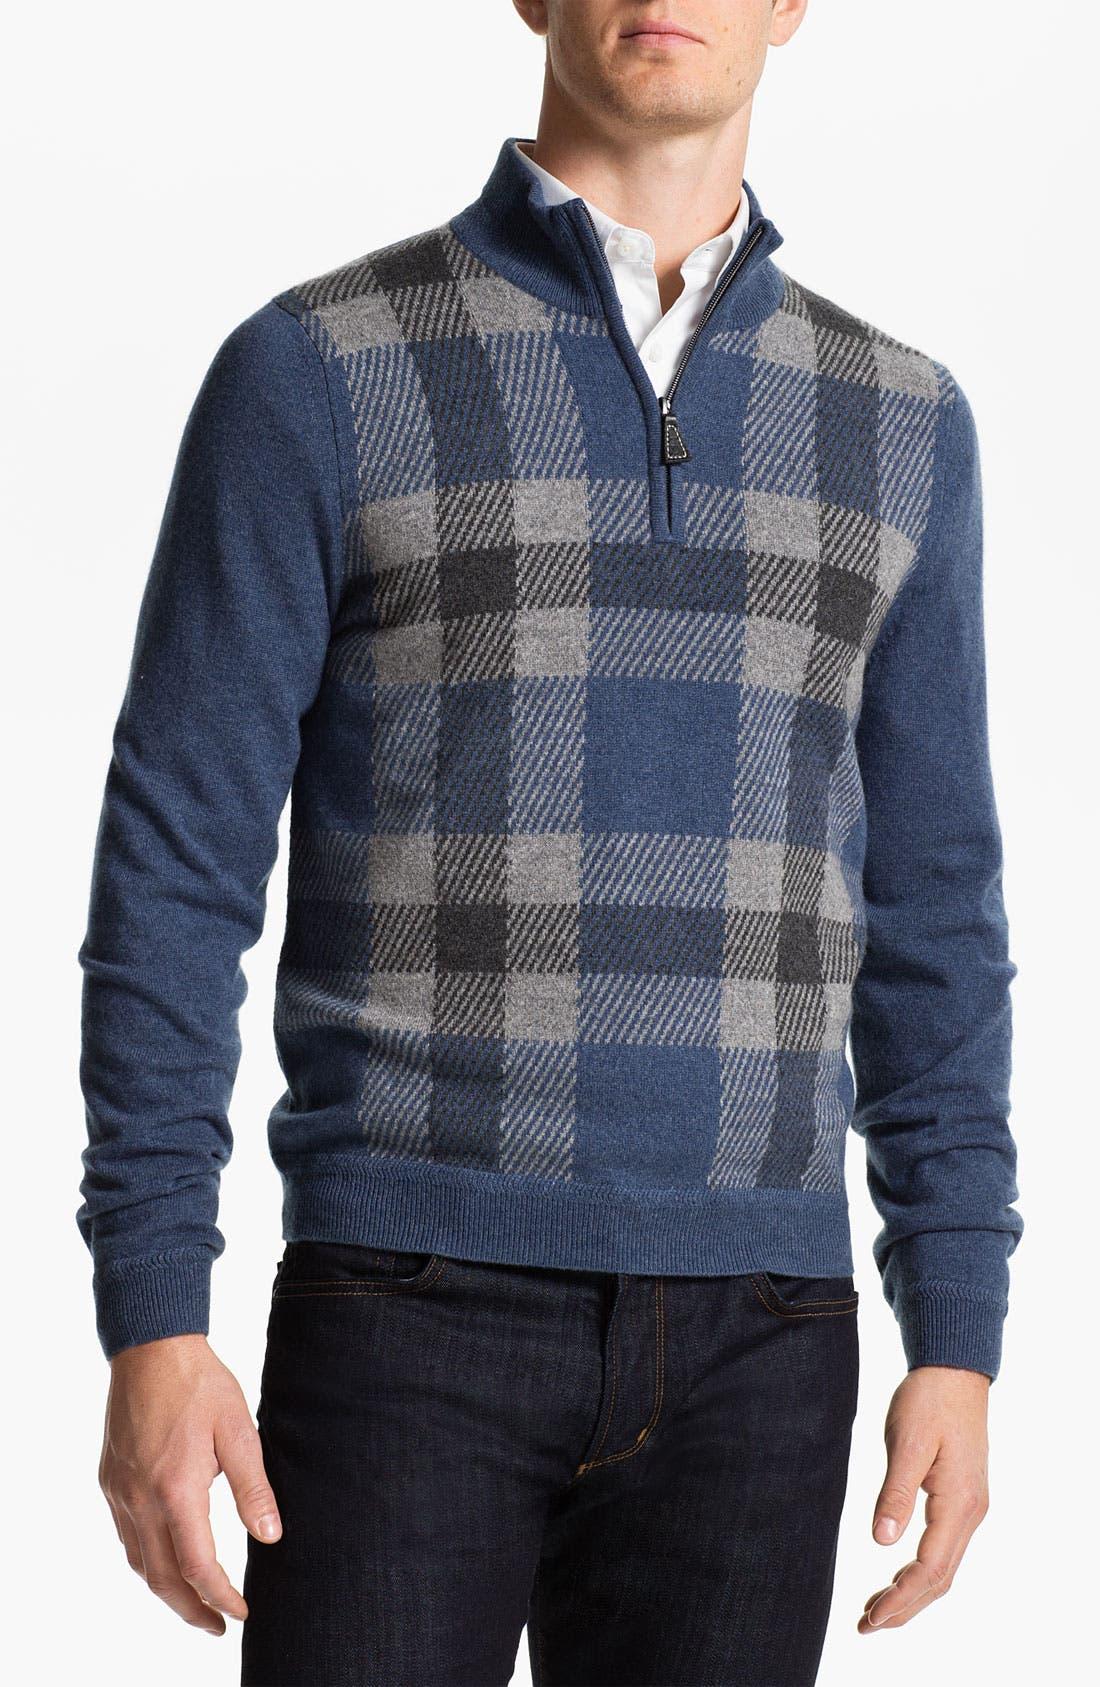 Alternate Image 1 Selected - John W. Nordstrom® Quarter Zip Cashmere Sweater